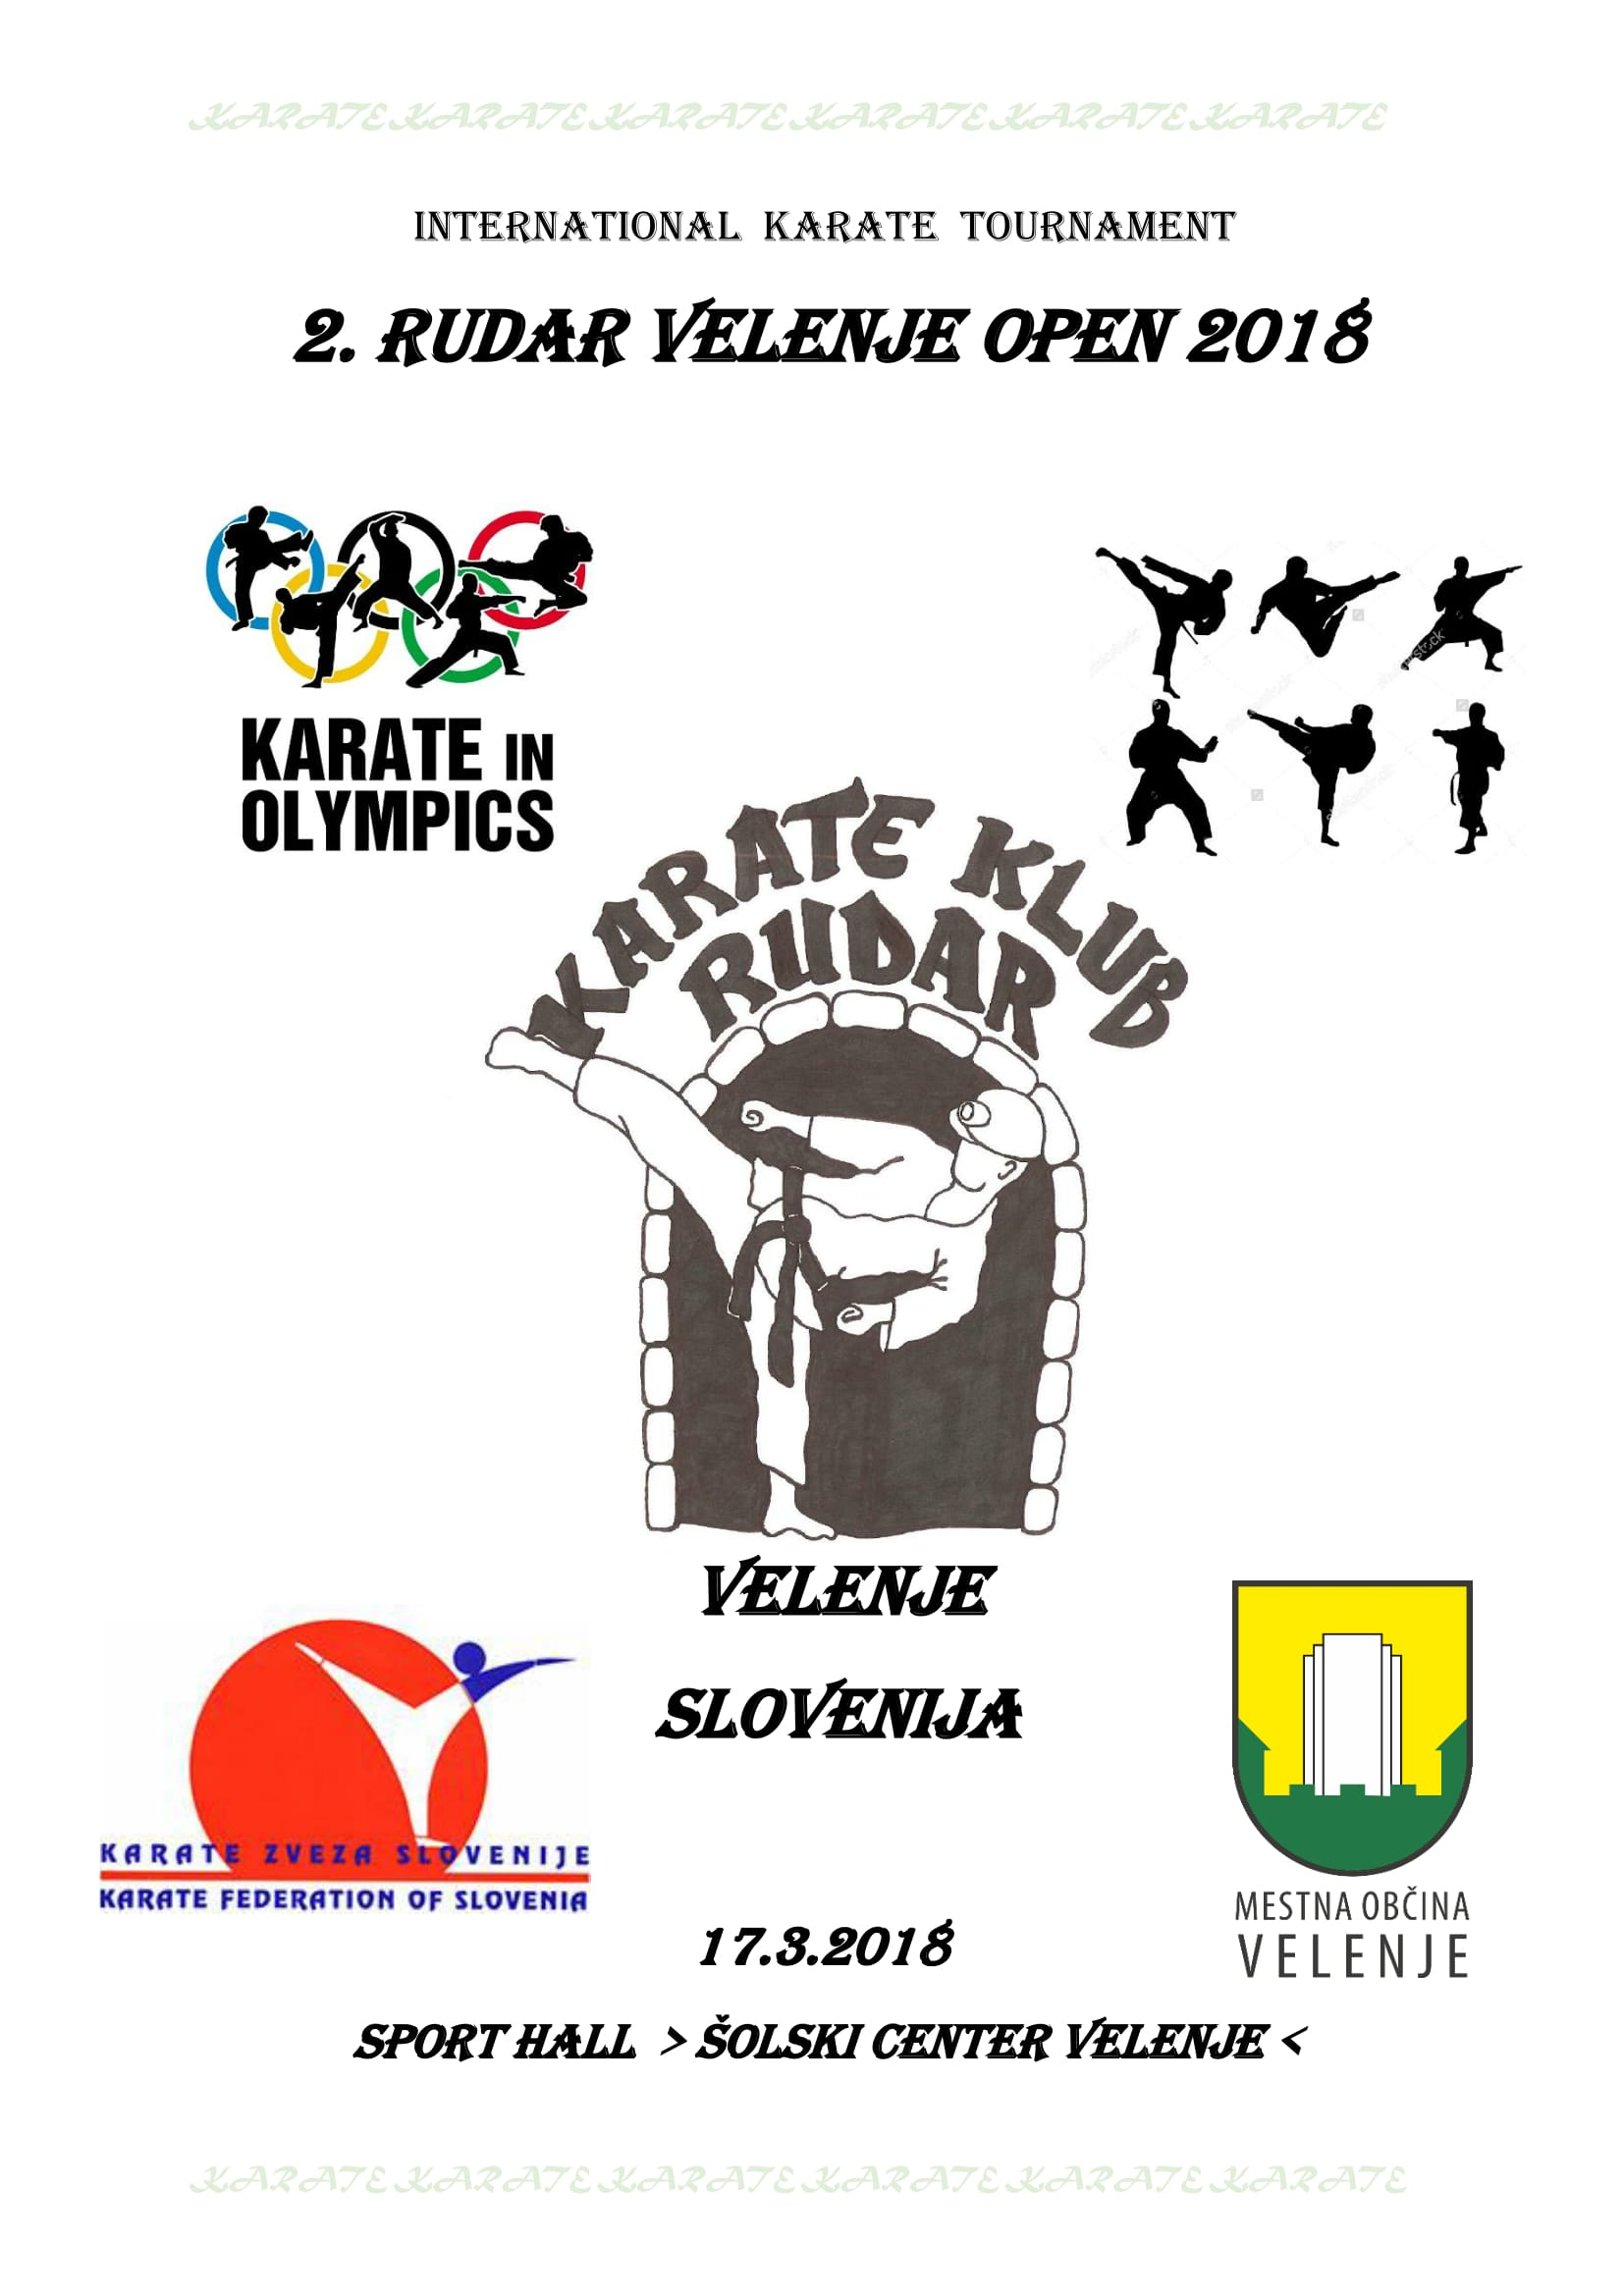 e-Karate.si - RUDAR VELENJE OPEN 2018 - Organizator : Karate Klub Rudar Velenje